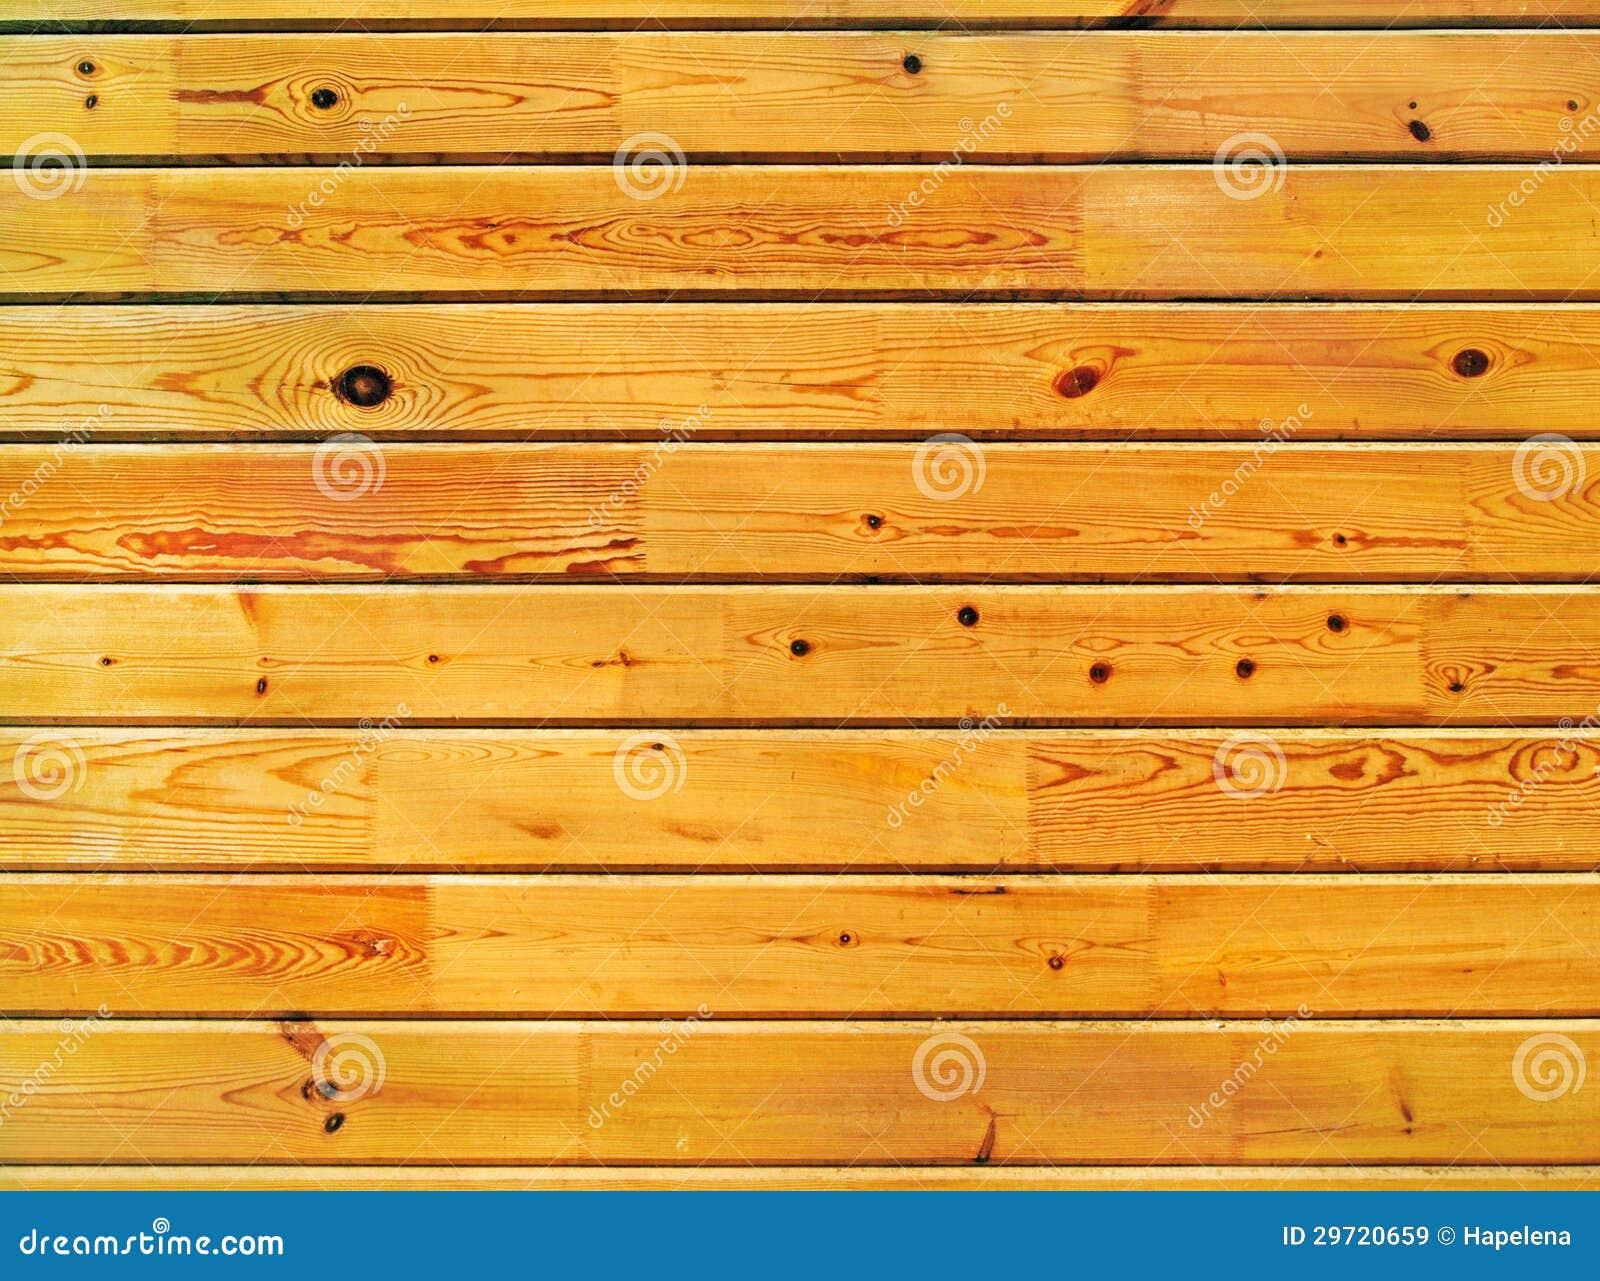 Lining Boards Stock Image Image Of Fragment Seam Pinewood 29720659 -> Foto De Parede De Madeira